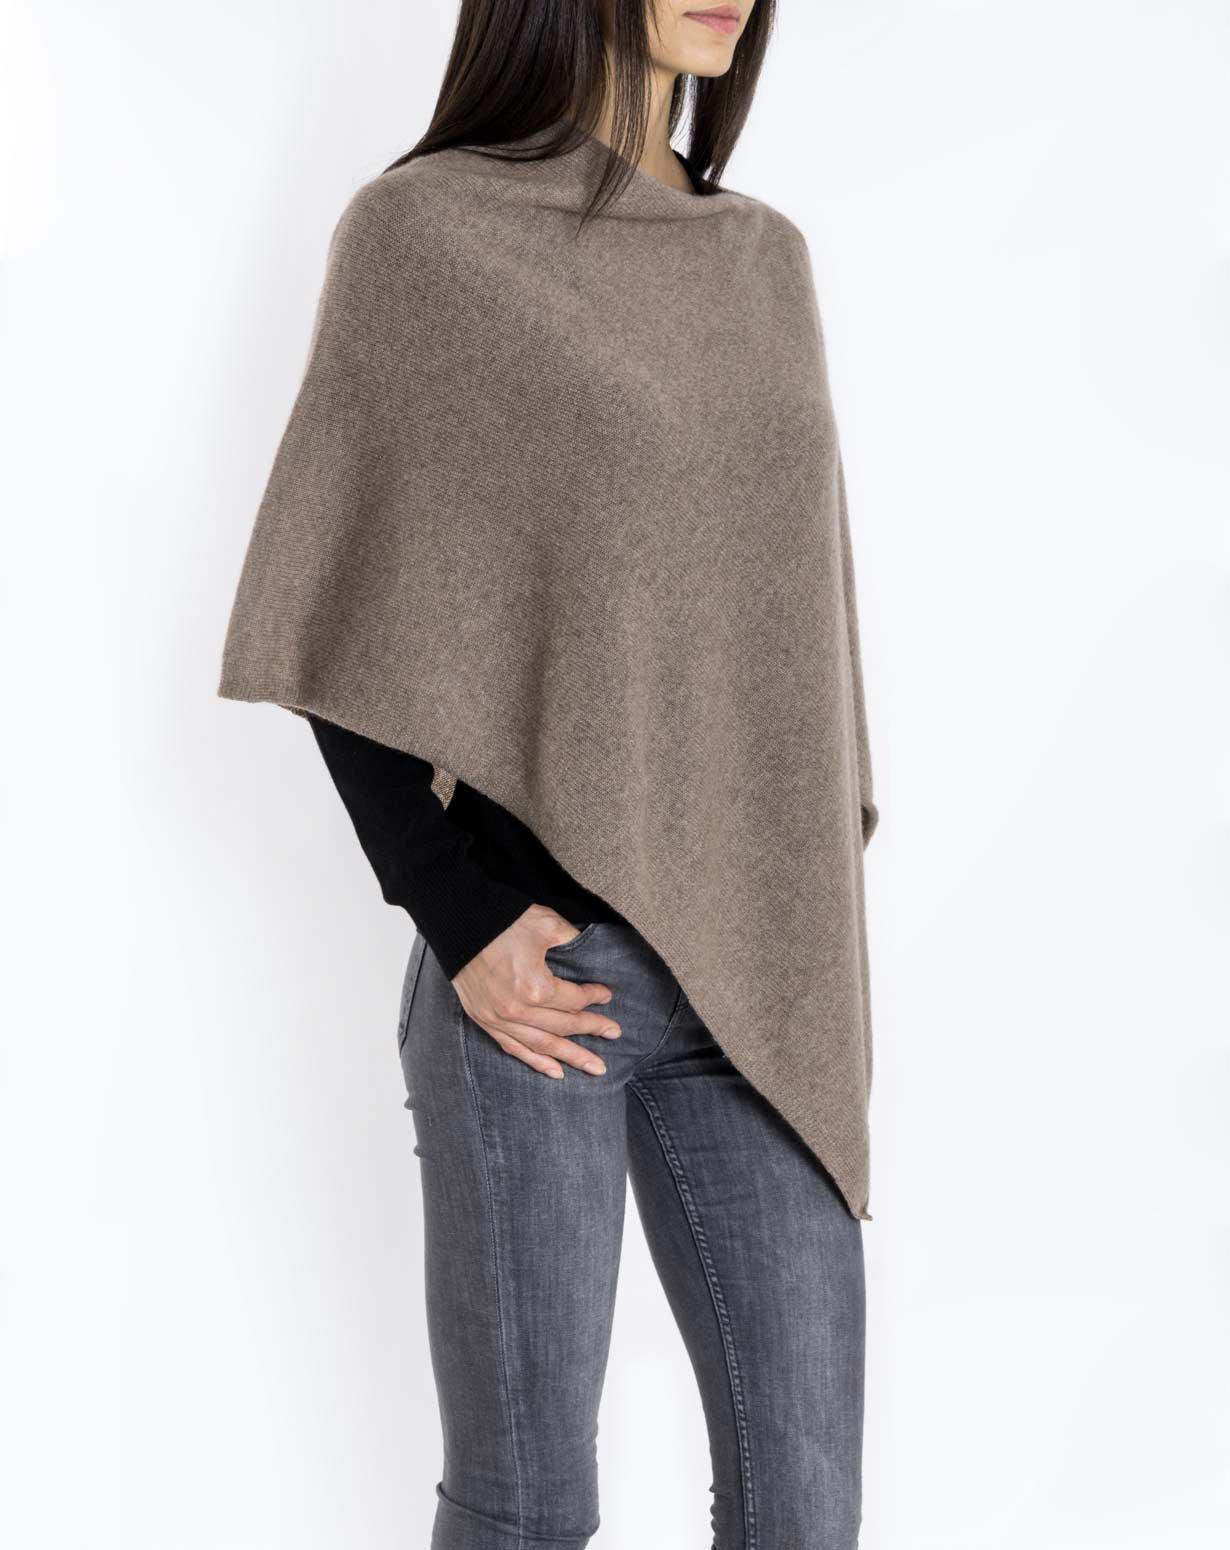 Cashmere poncho womenu0027s essential pure cashmere poncho gqkohsz